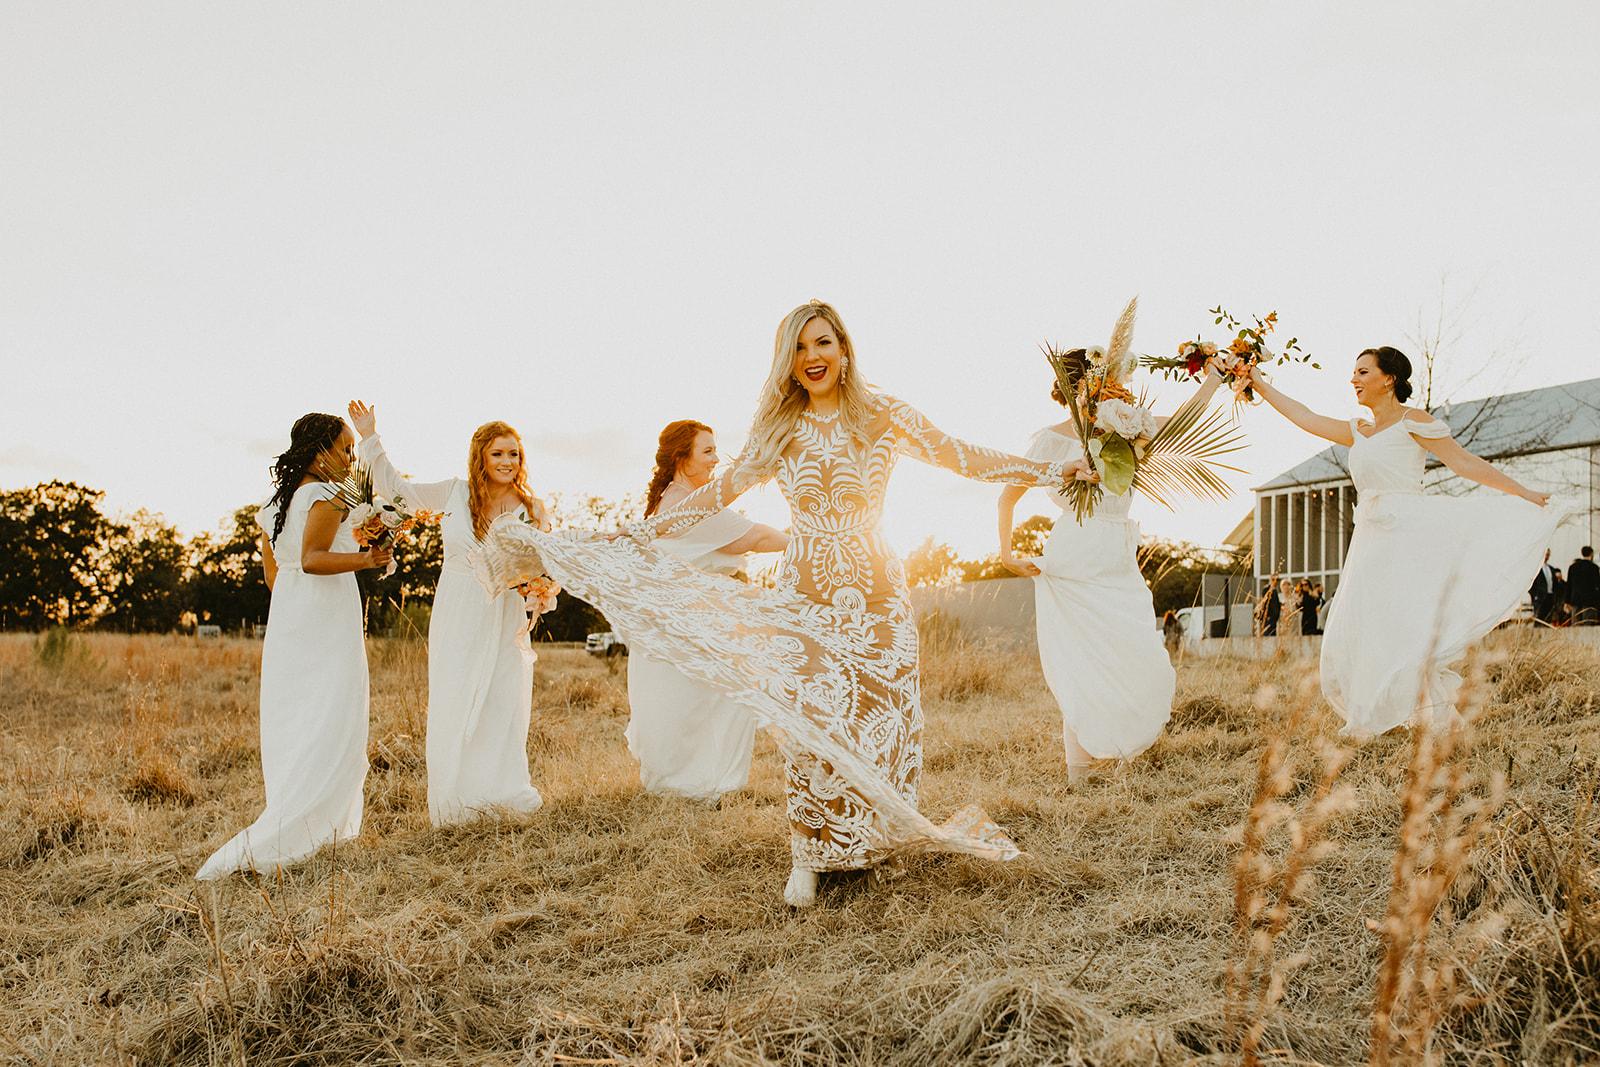 Tropical Colorful Frond Bridesmaid + Bride Bouquets + White Creamy Bridesmaid Dresses + Rue De Seine Wedding Dress + wild free bridesmaids wedding party portraits + Dallas Wedding Florist Tersilla